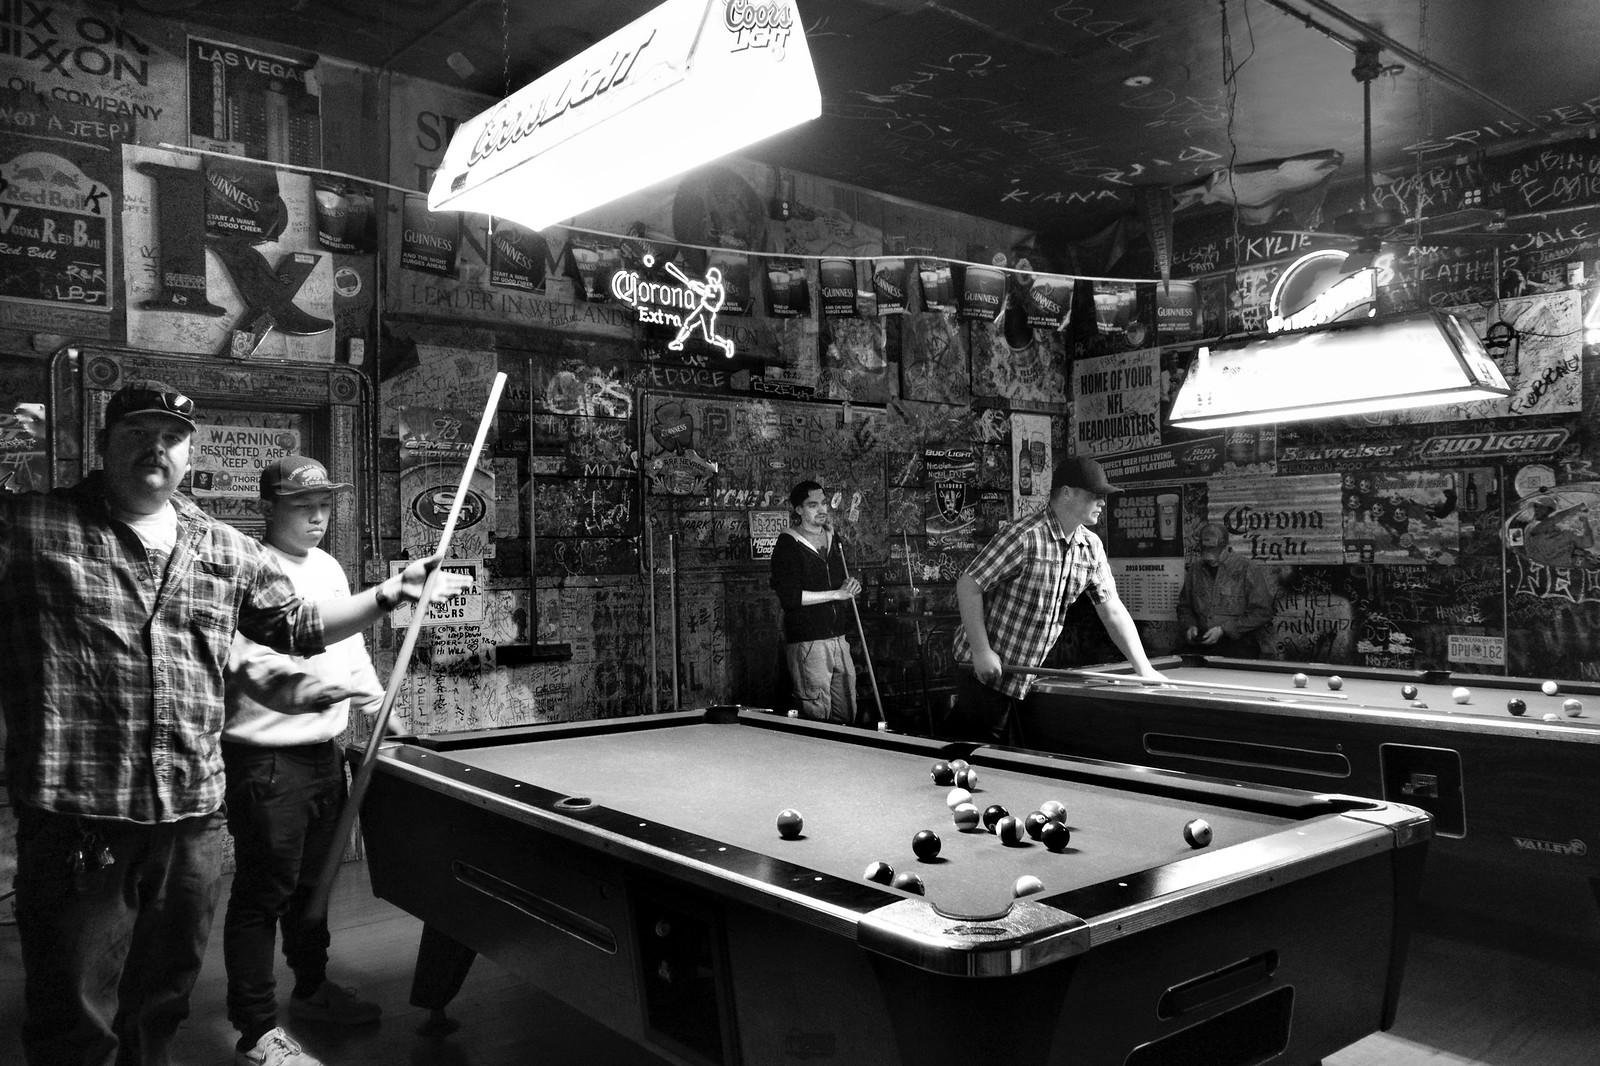 Thompson's Corner Saloon - Cordelia, CA | by Rex Mandel